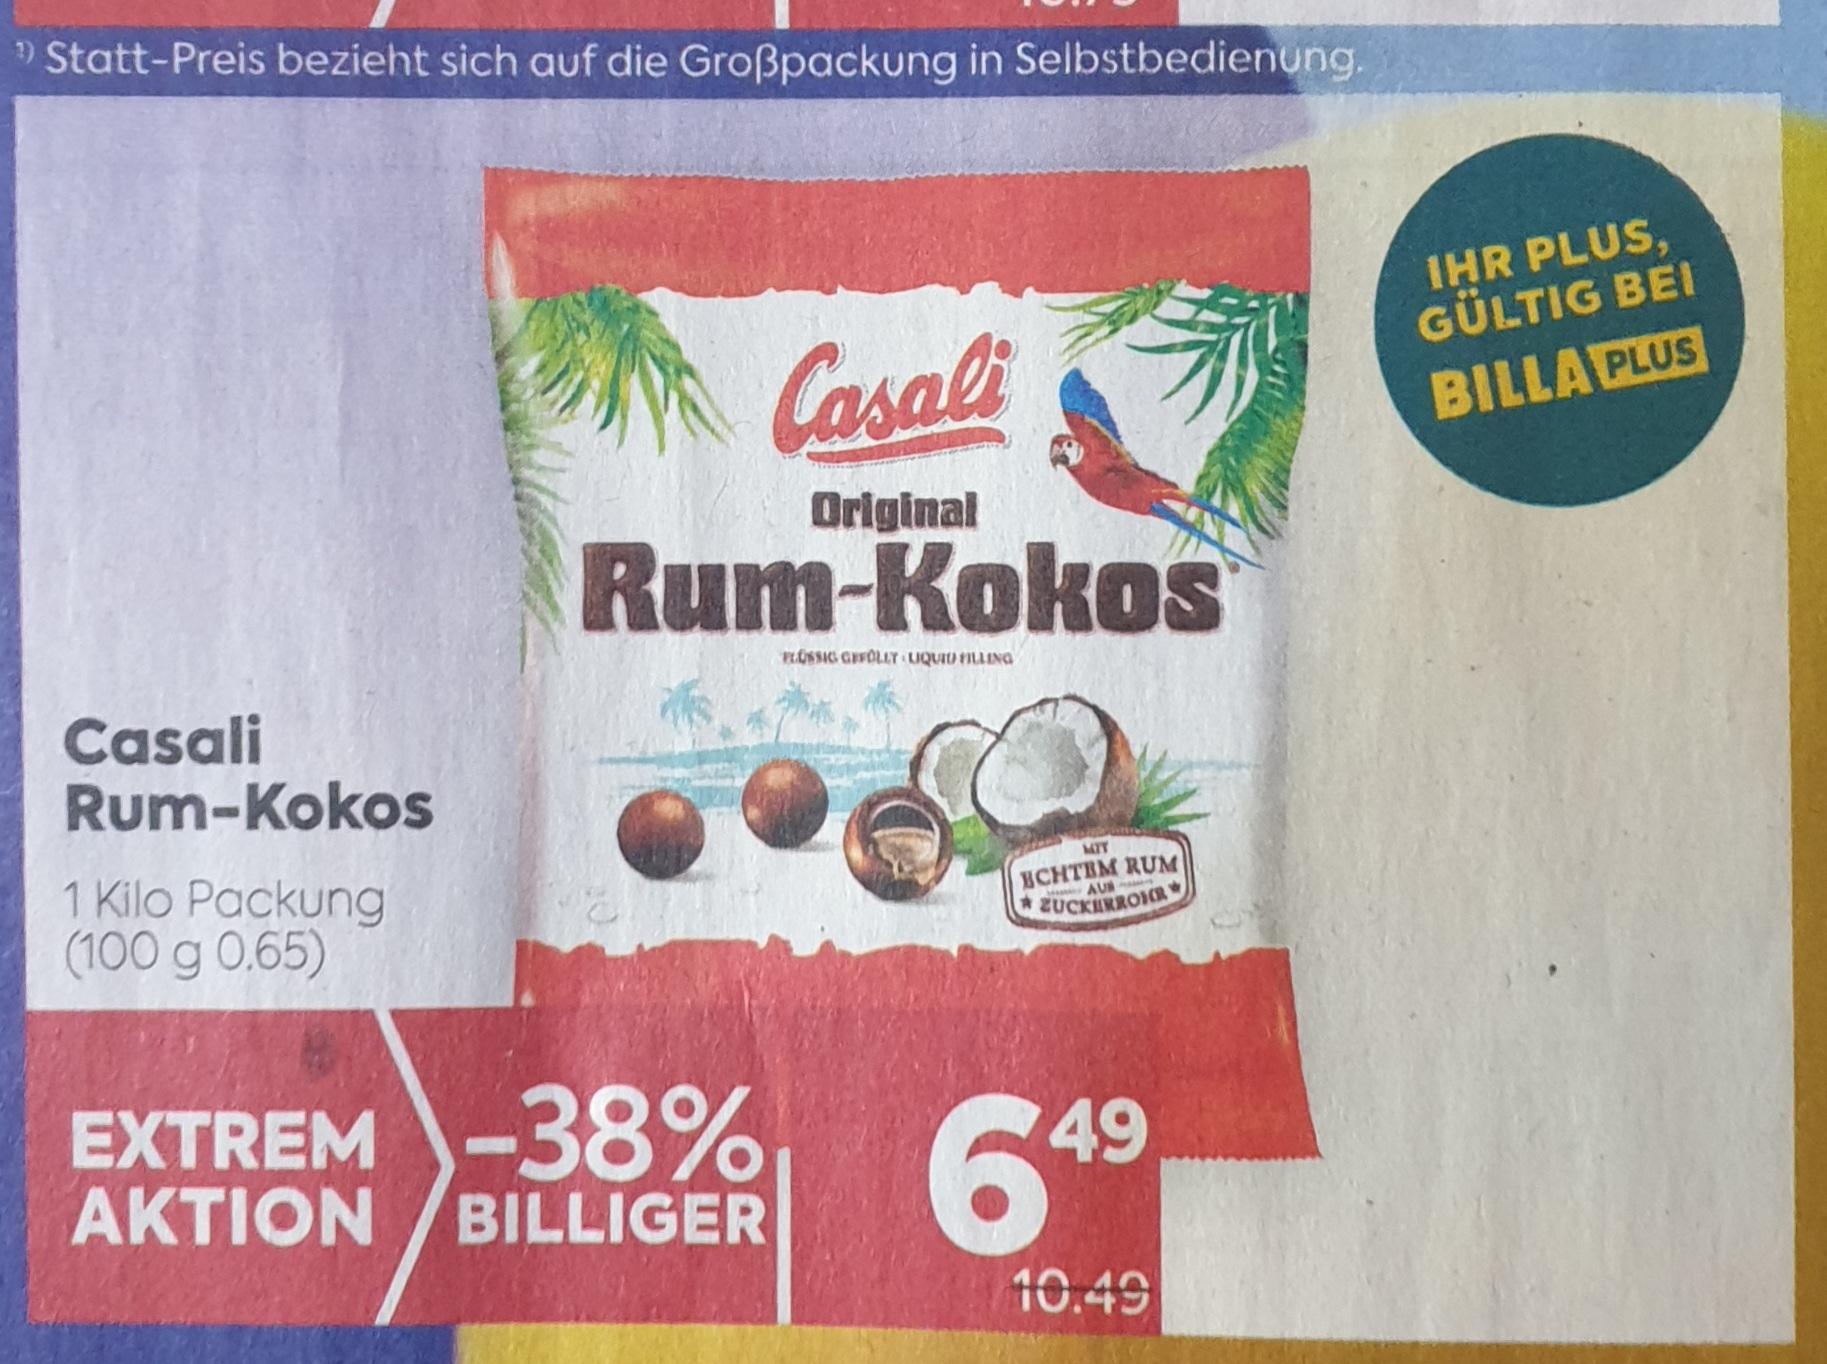 1 kg Casali-Rum Kokos-Kugeln um 6,49 bei Billa-Plus